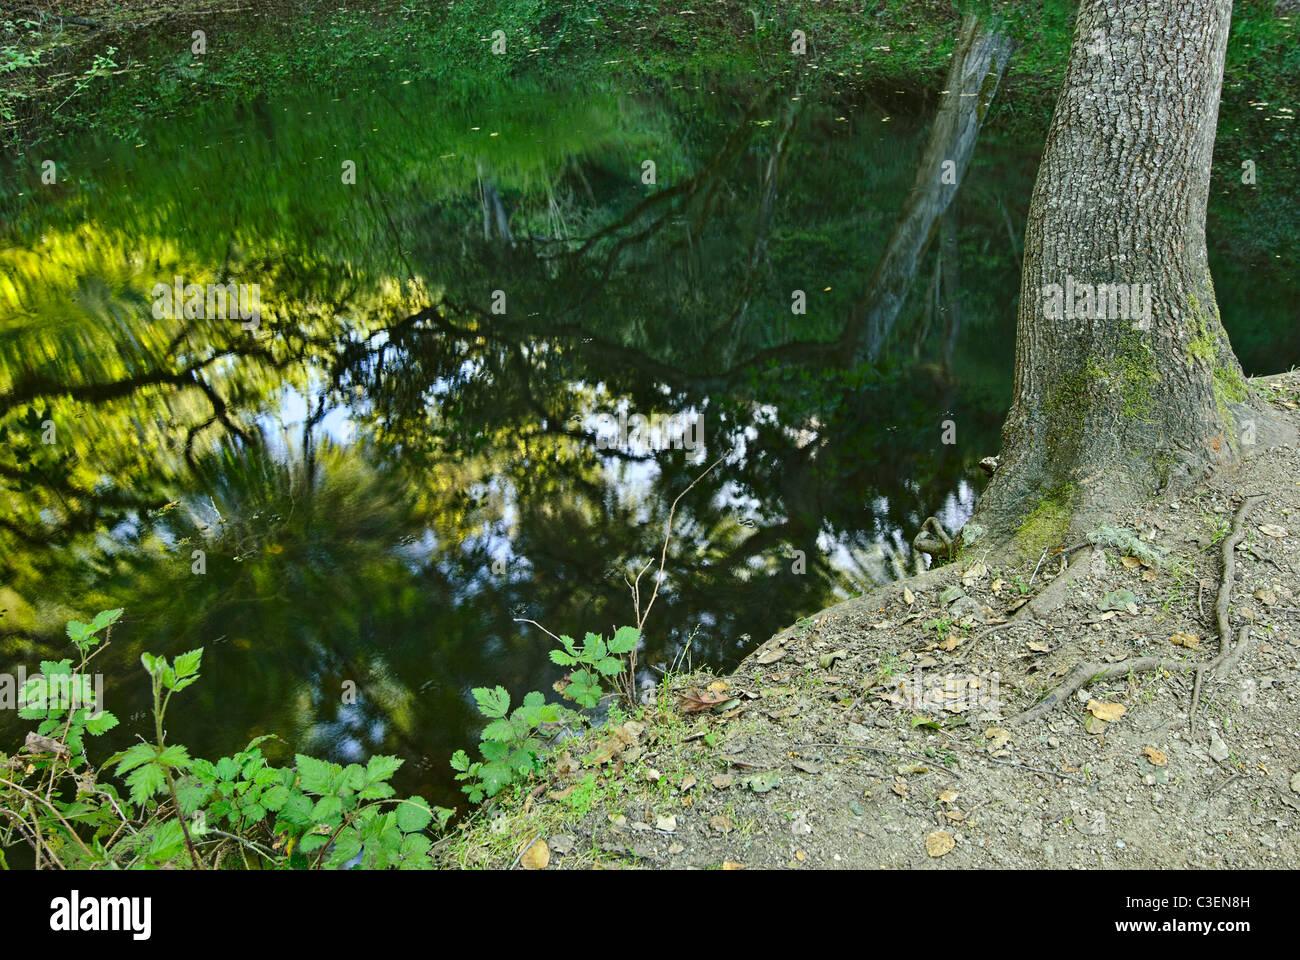 Fern pond at Garland Ranch Park, Monterey, CA. - Stock Image